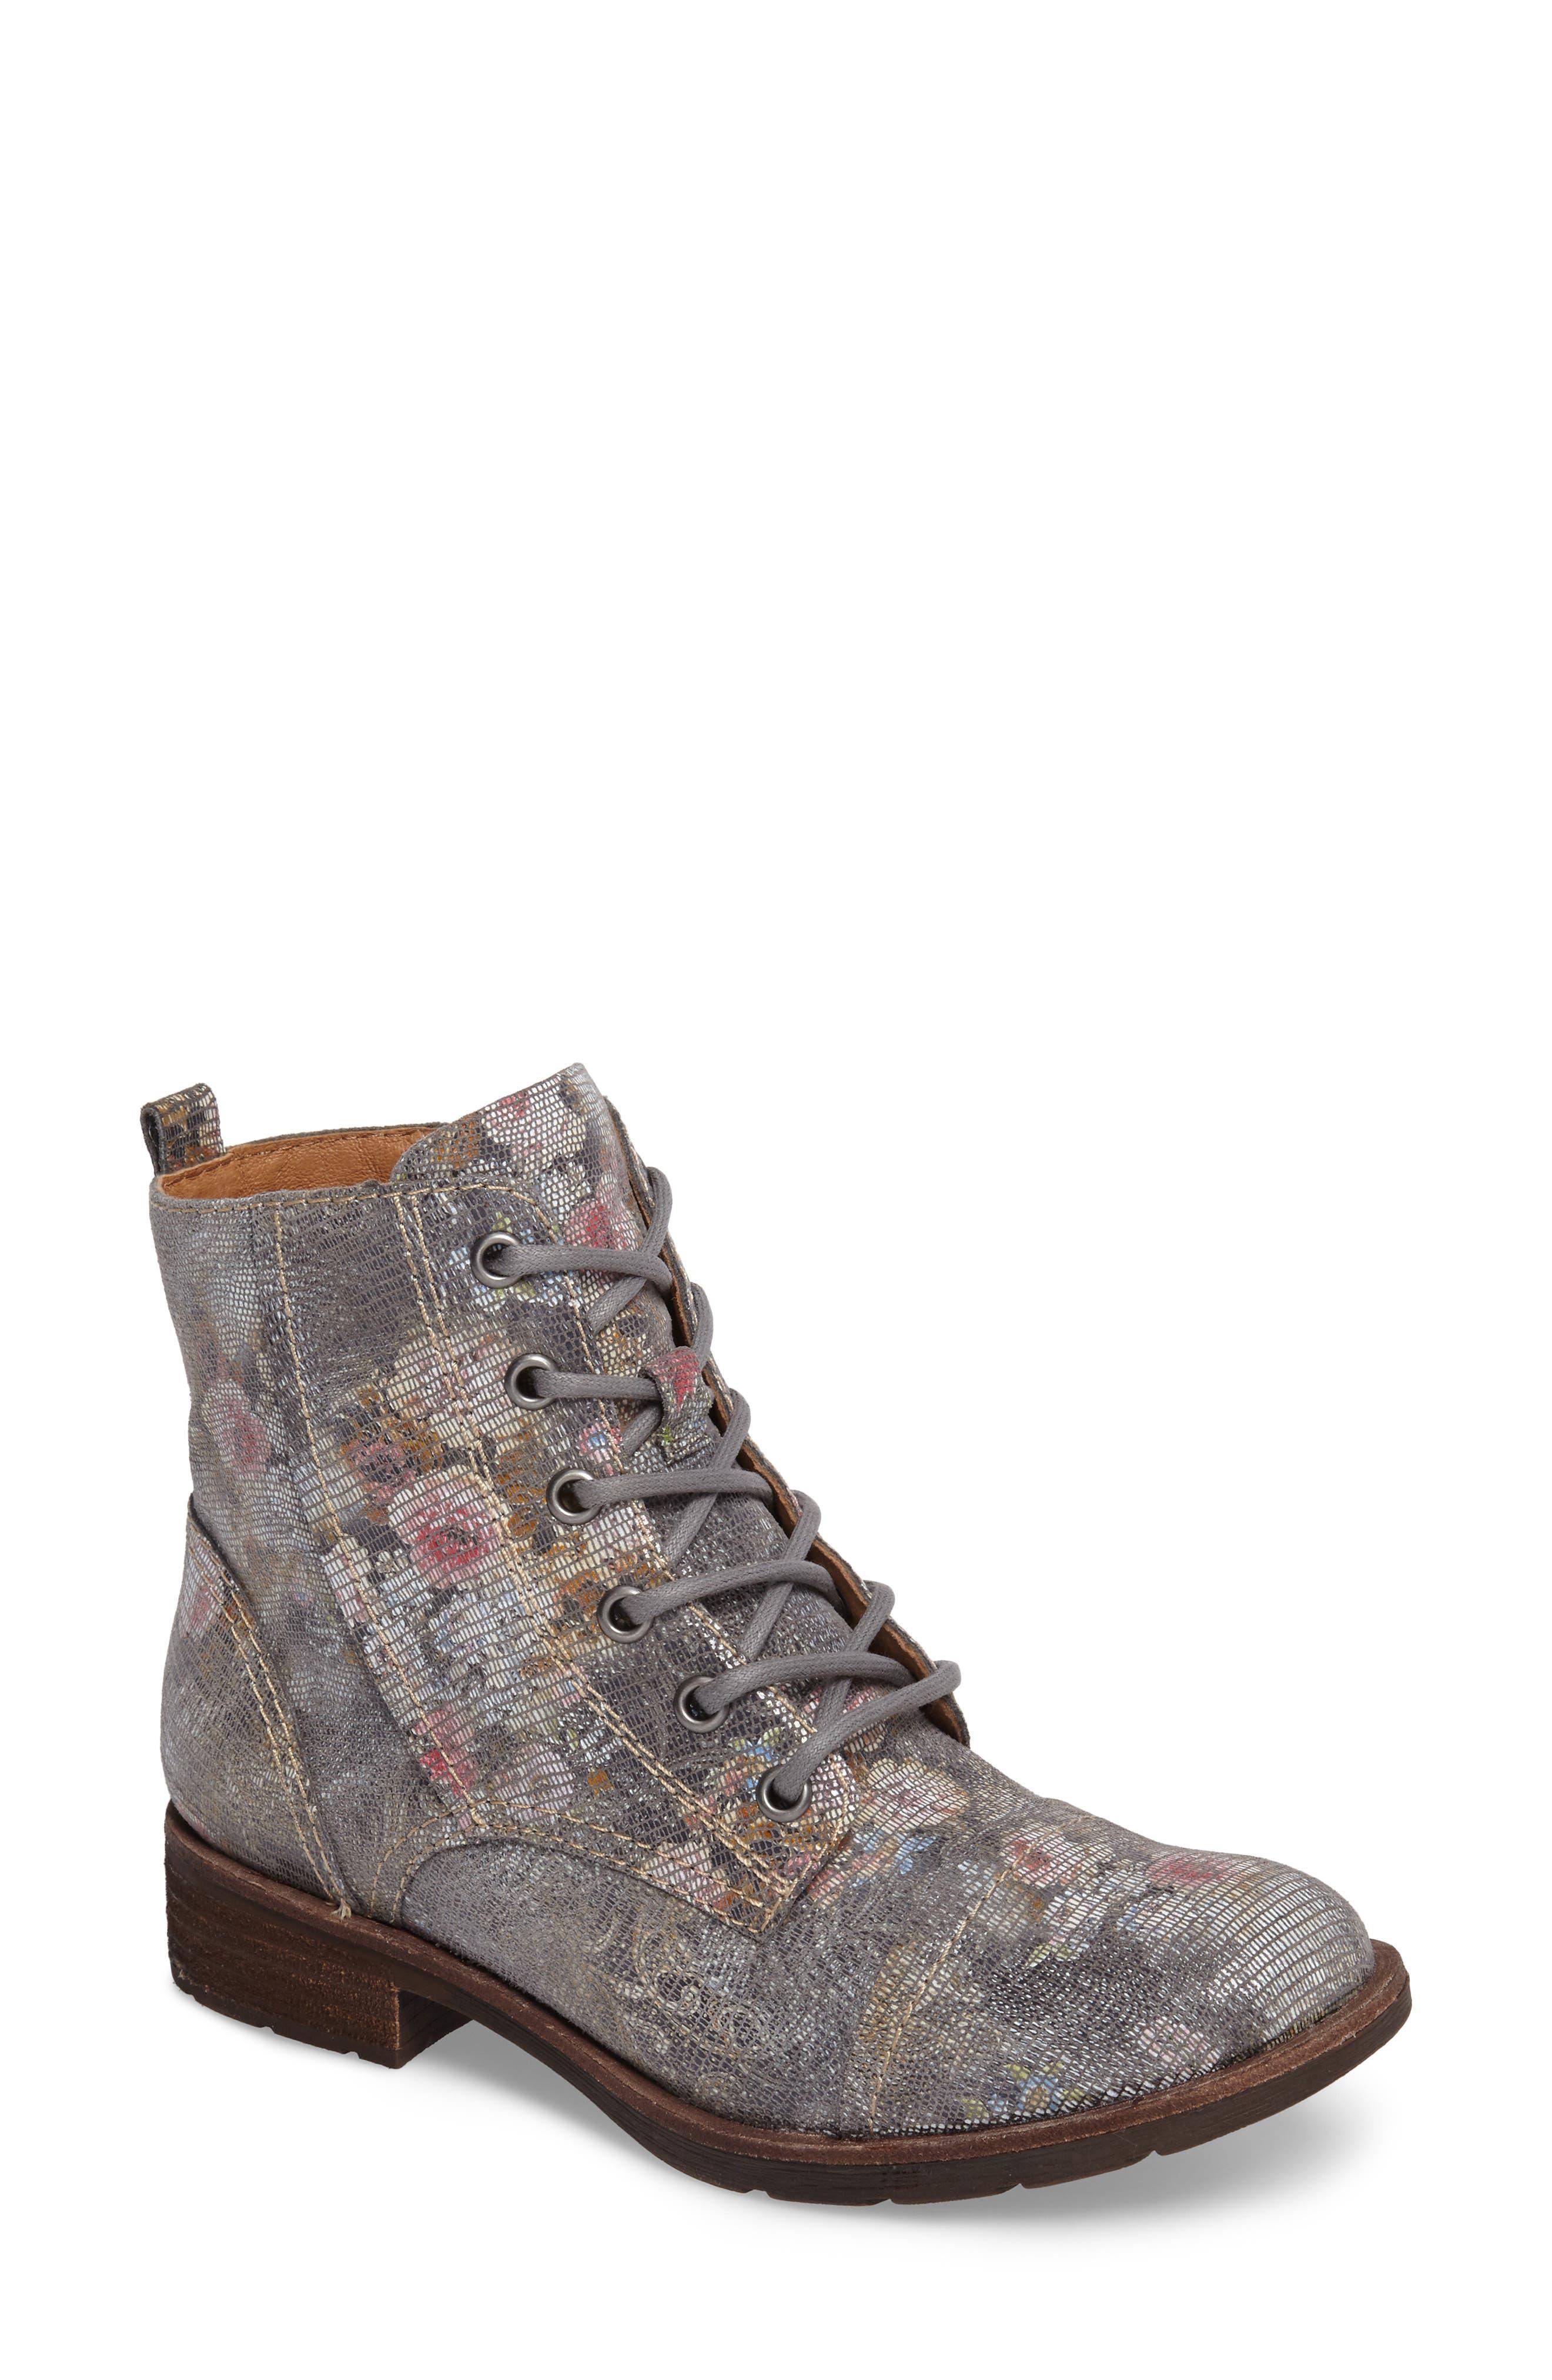 Belton Cap Toe Combat Boot,                             Main thumbnail 1, color,                             Grey Leather